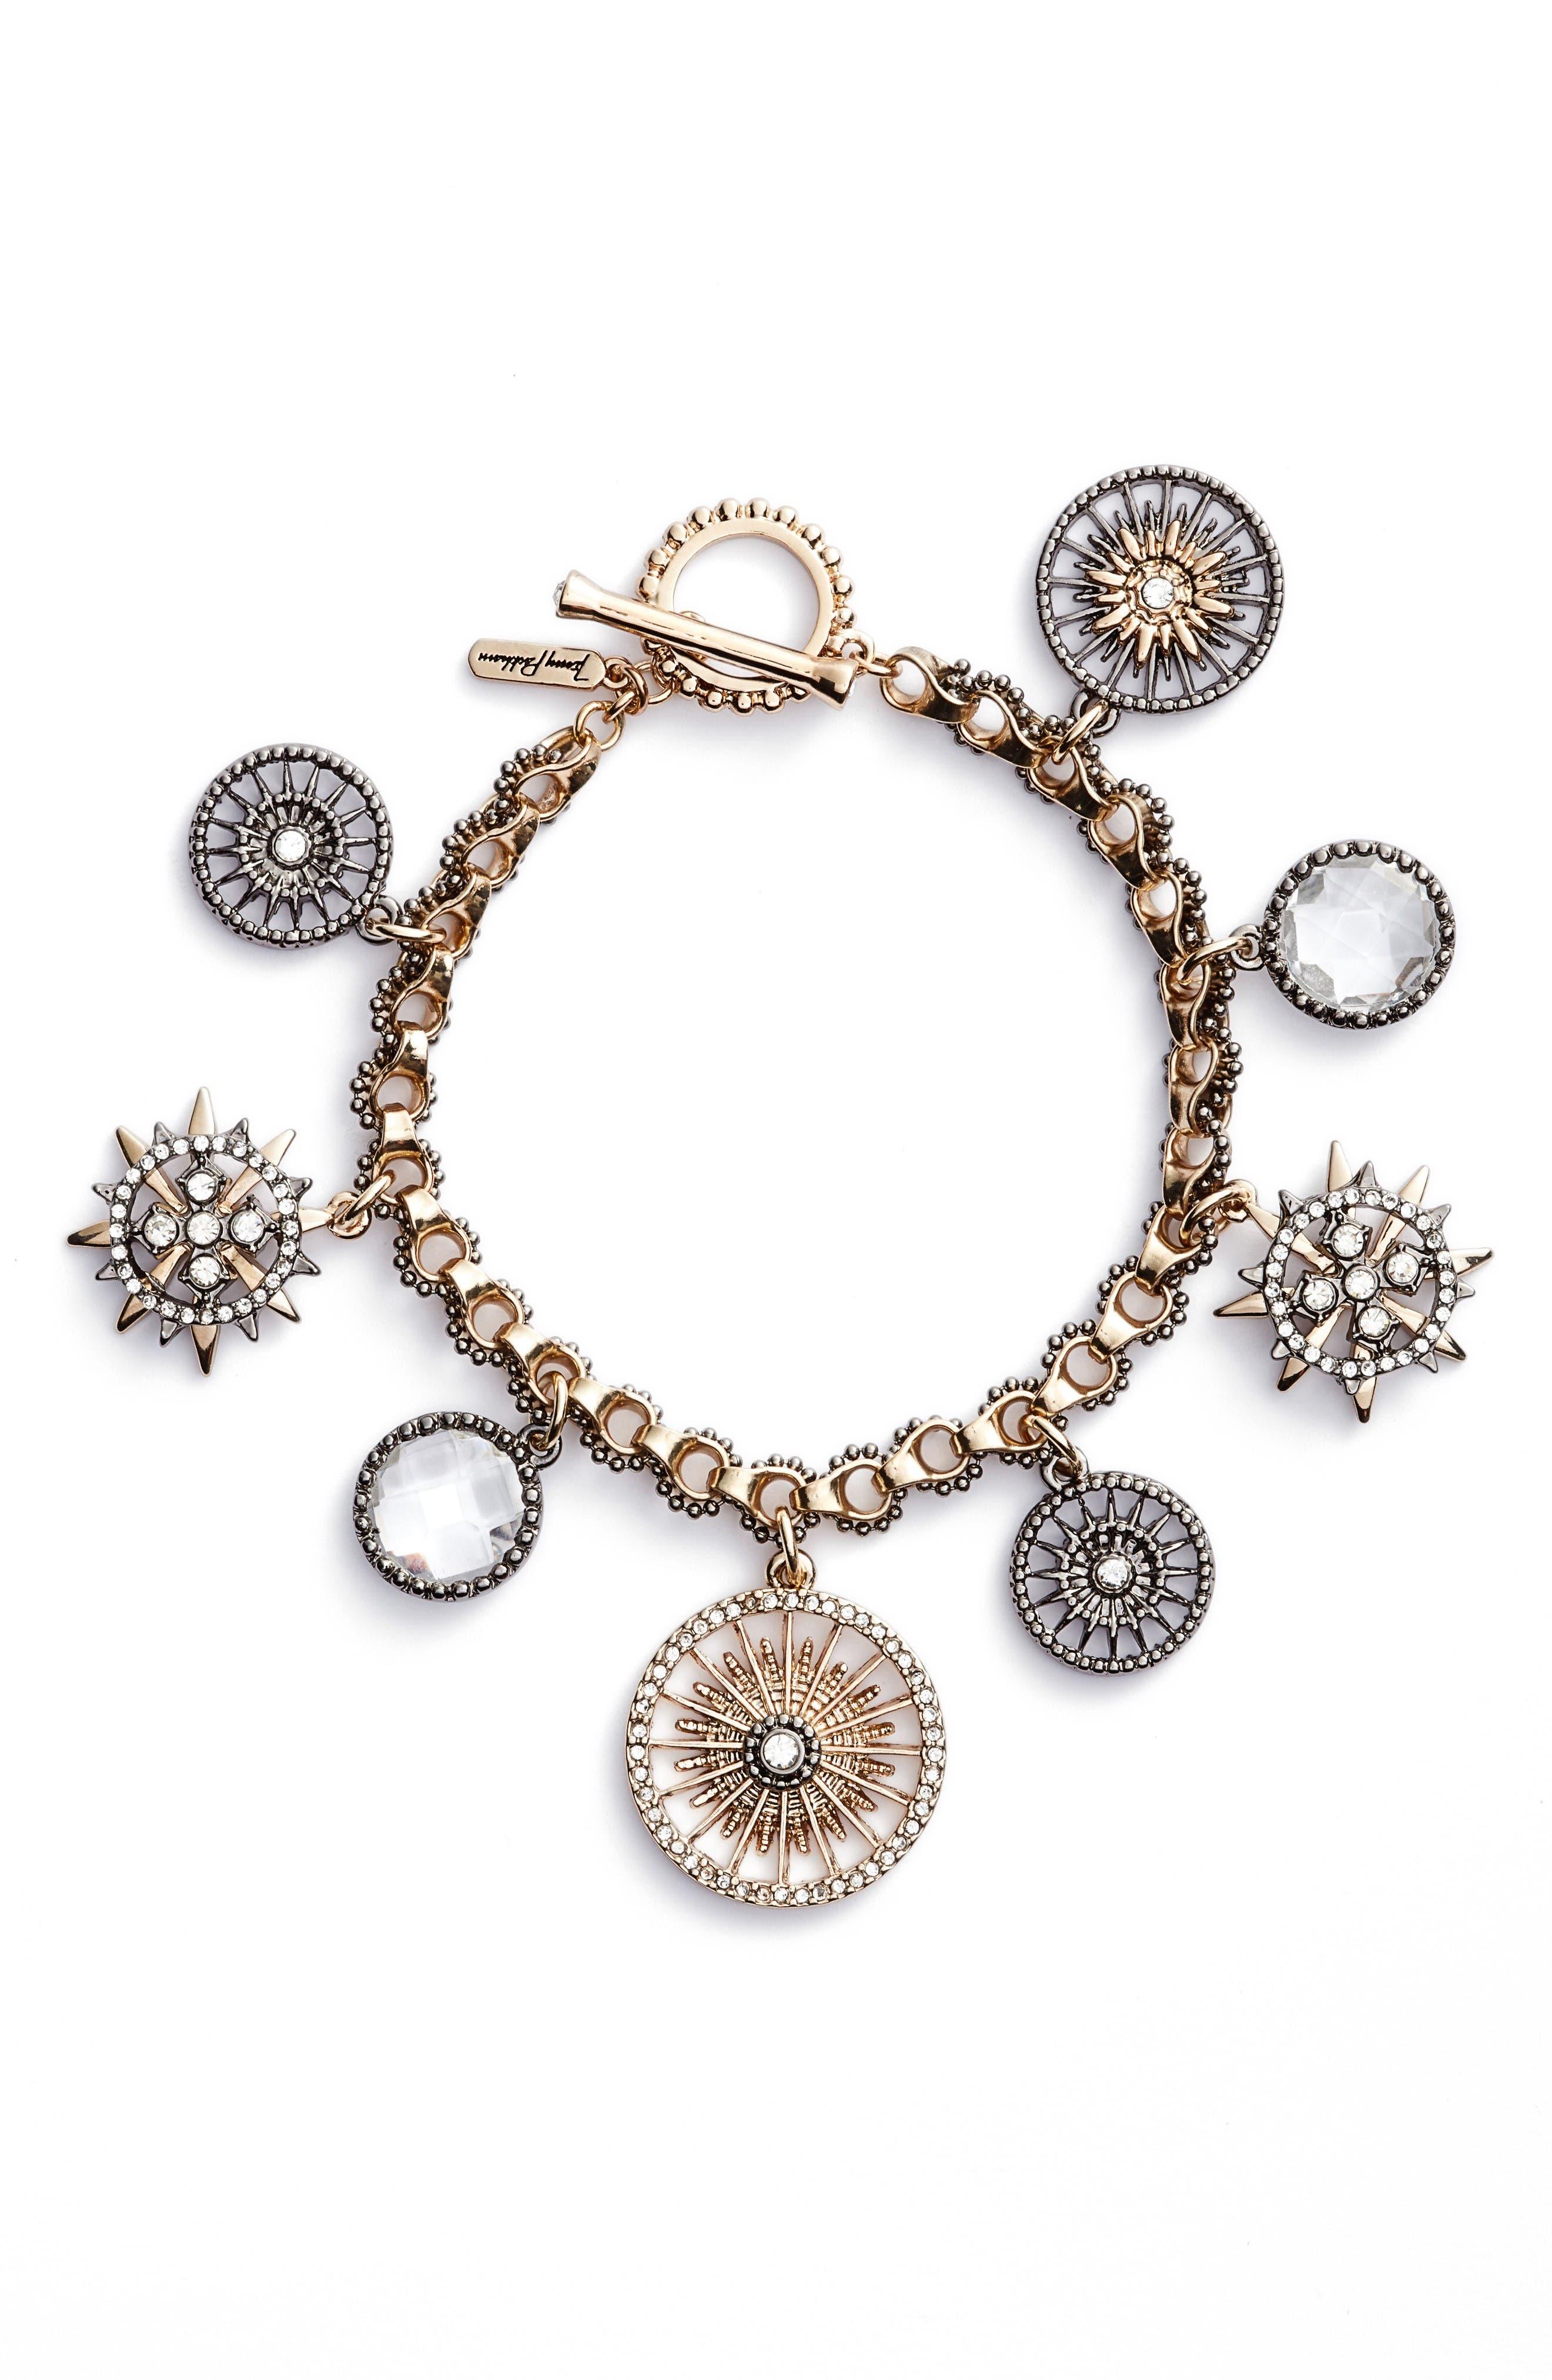 Alternate Image 1 Selected - Jenny Packham Charm Bracelet